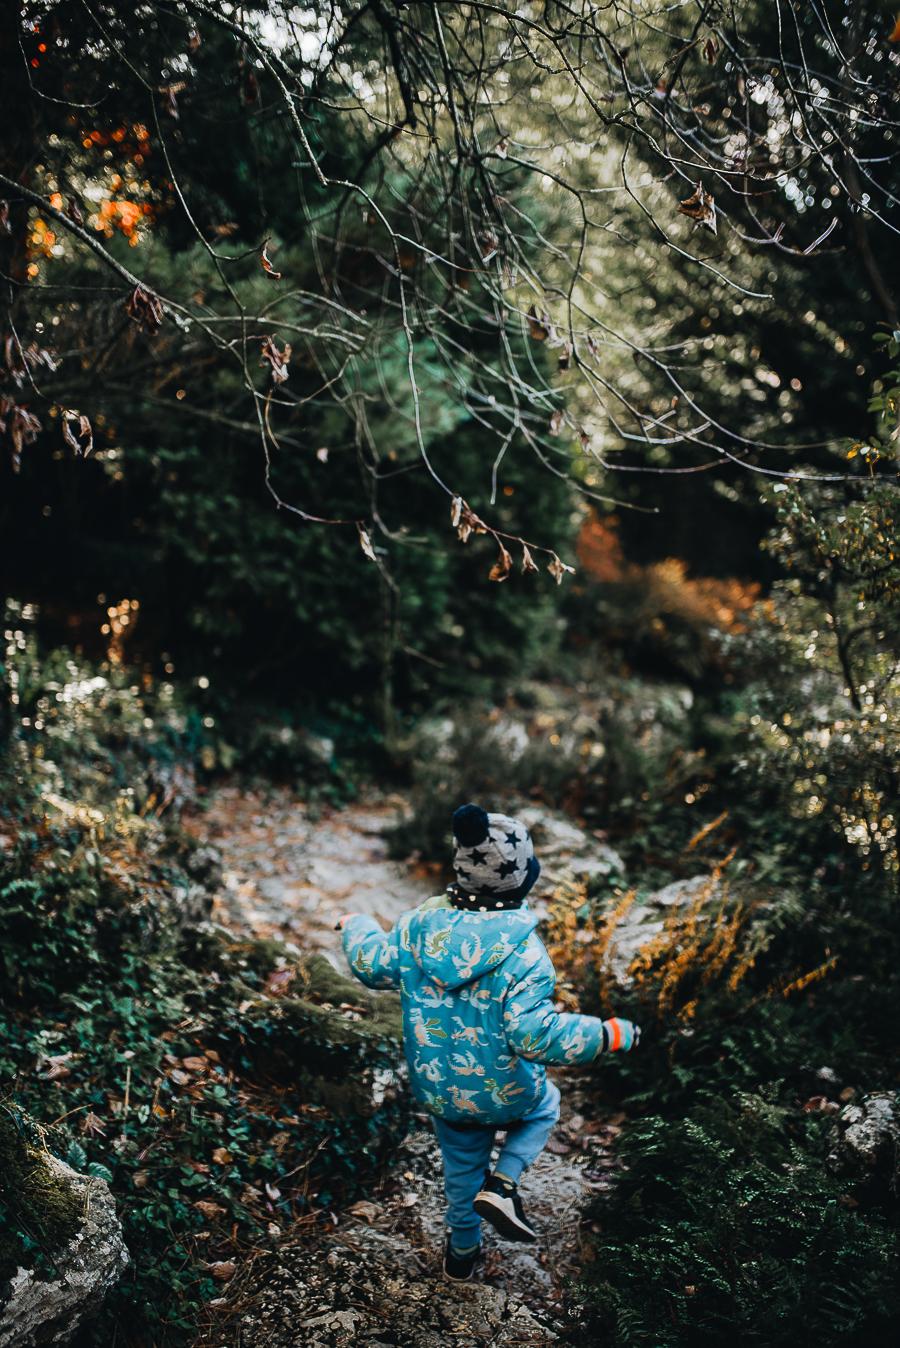 OurBeautifulAdventure-GettingOutdoorsinWales-October-websize-0335.jpg